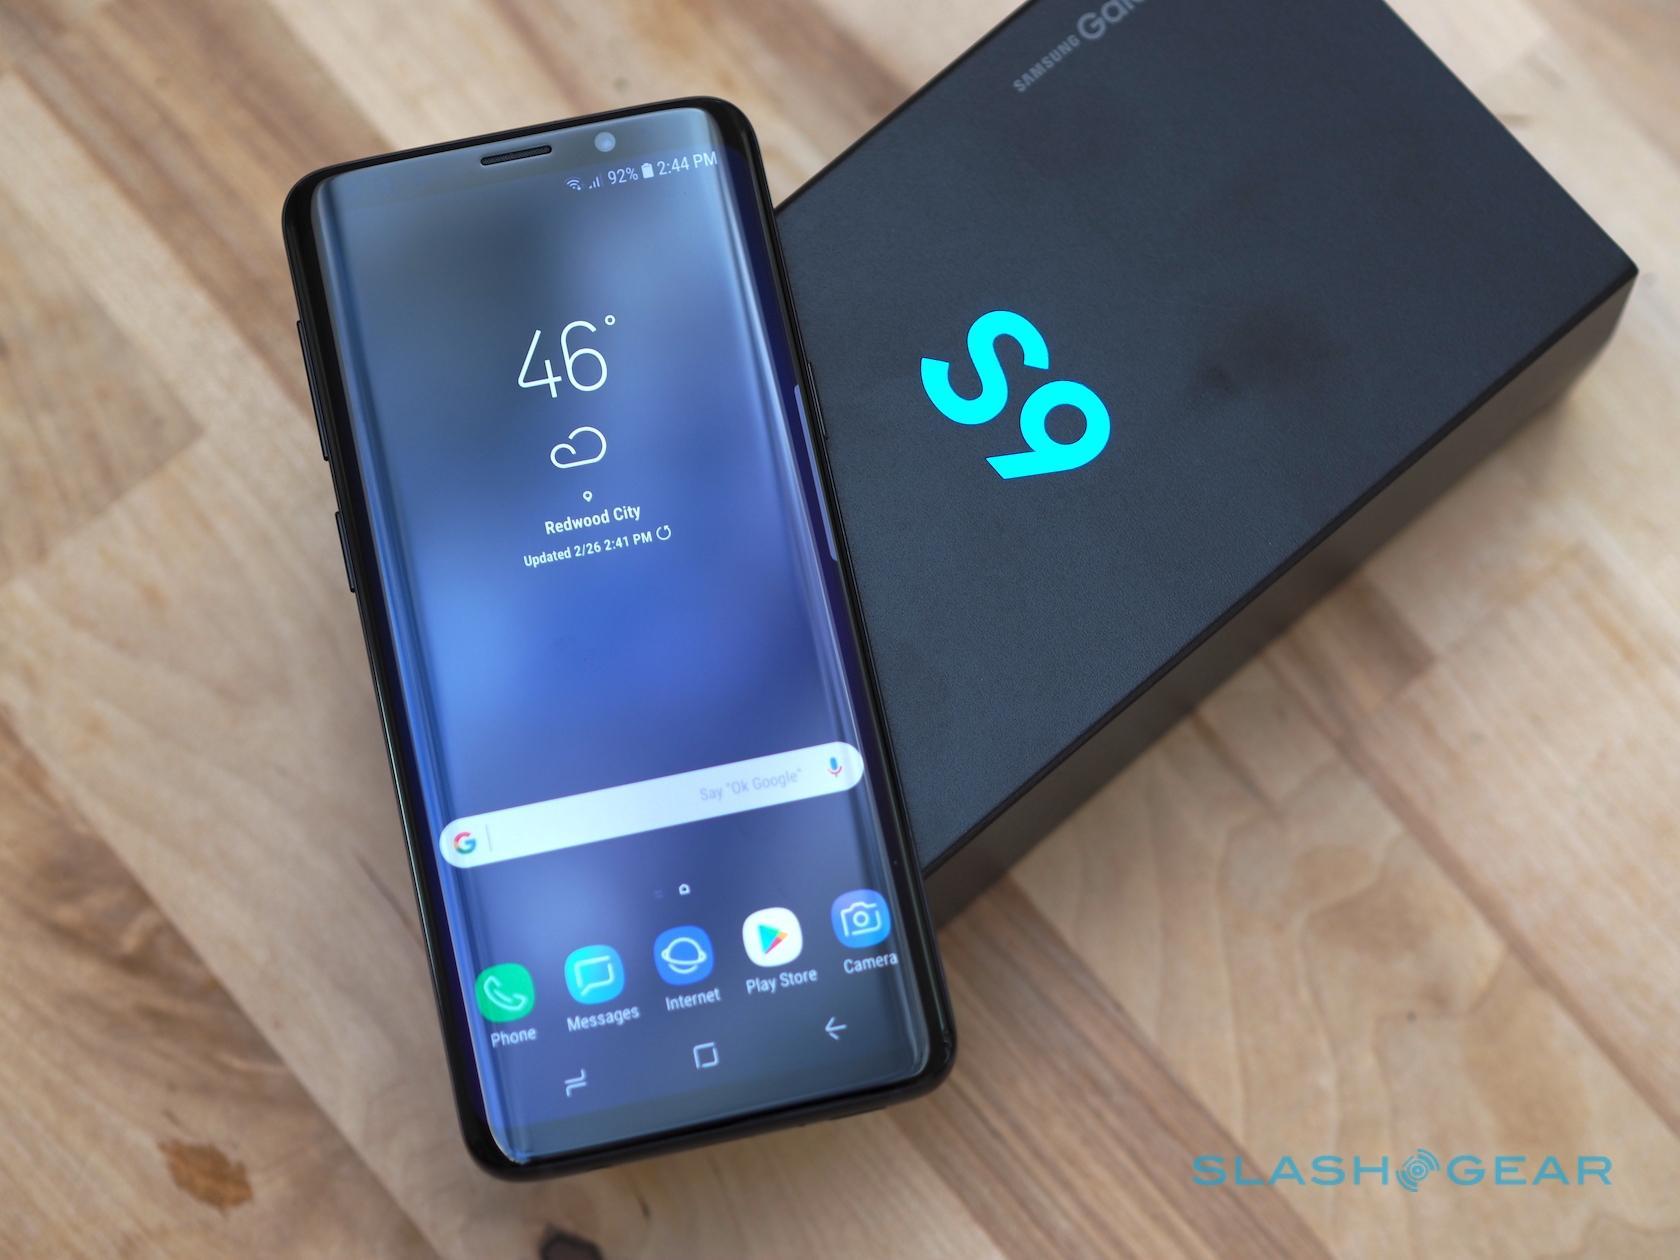 Samsung galaxy s9 developer options